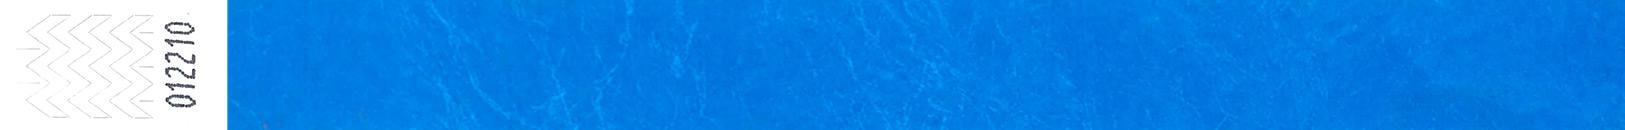 https://cdn.allbuyone.com/media/image/fe/44/f8/kontrollbaender-blau.jpg